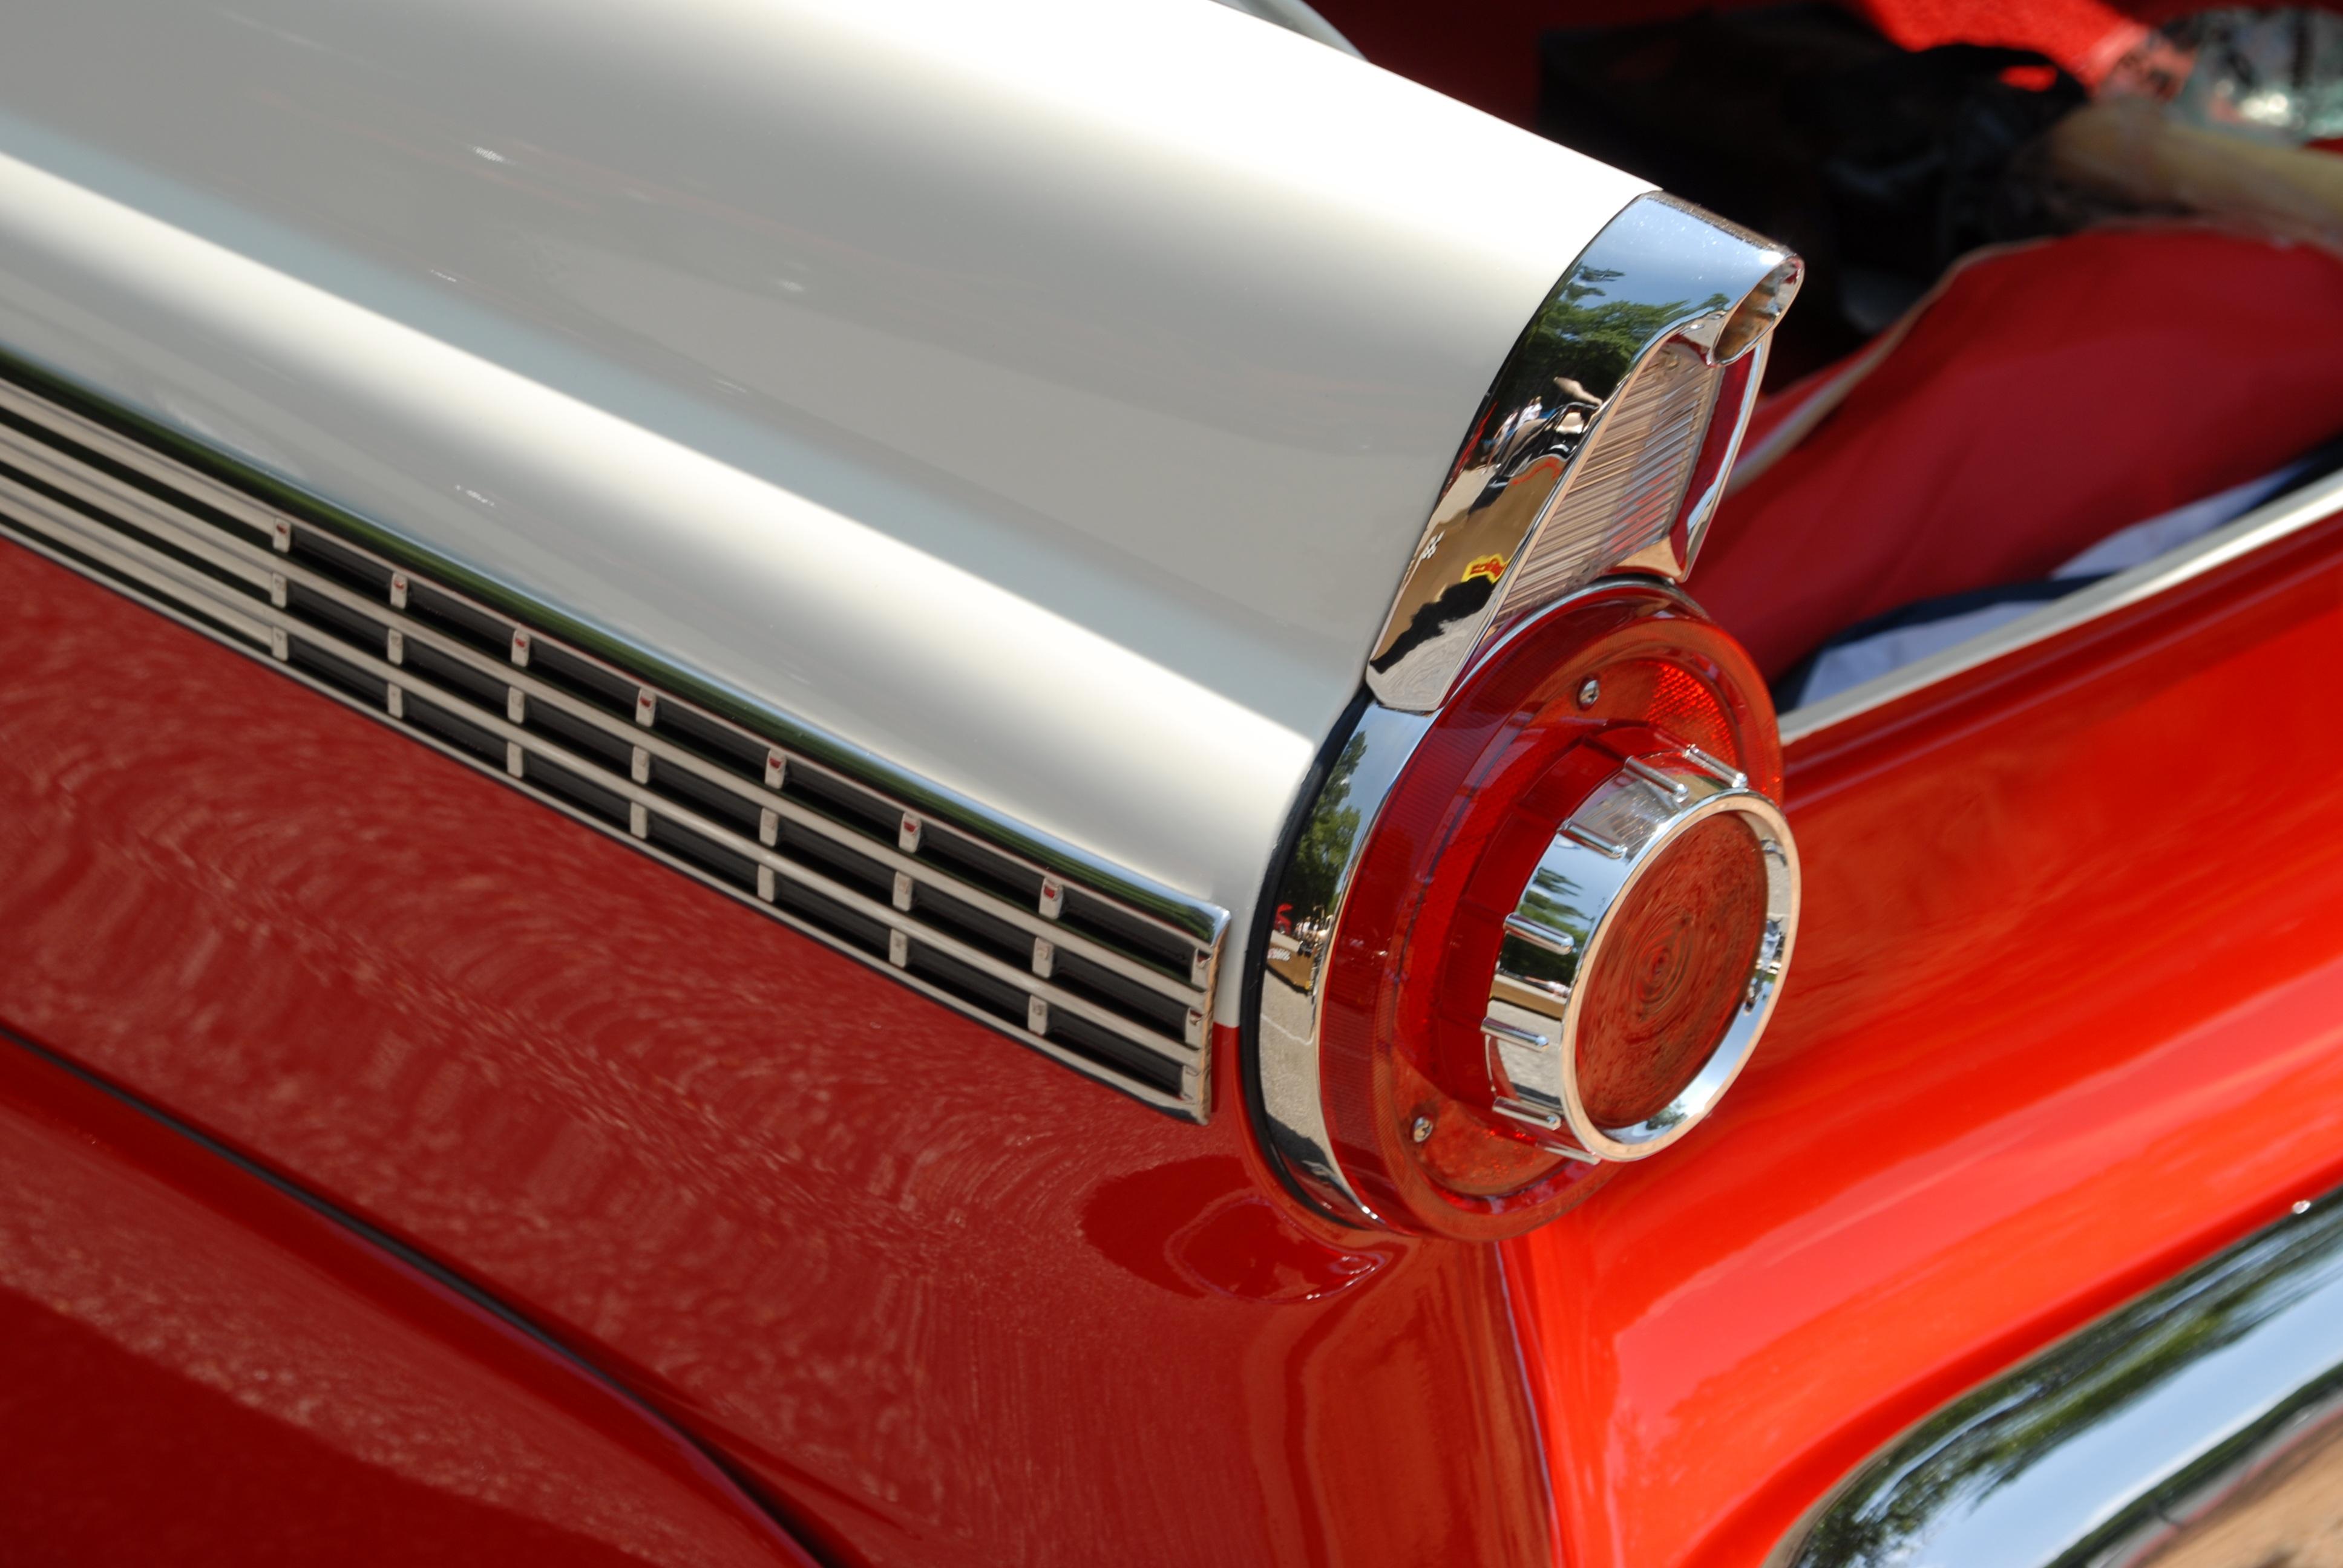 Free Images : antique, wheel, retro, old, transportation, model ...